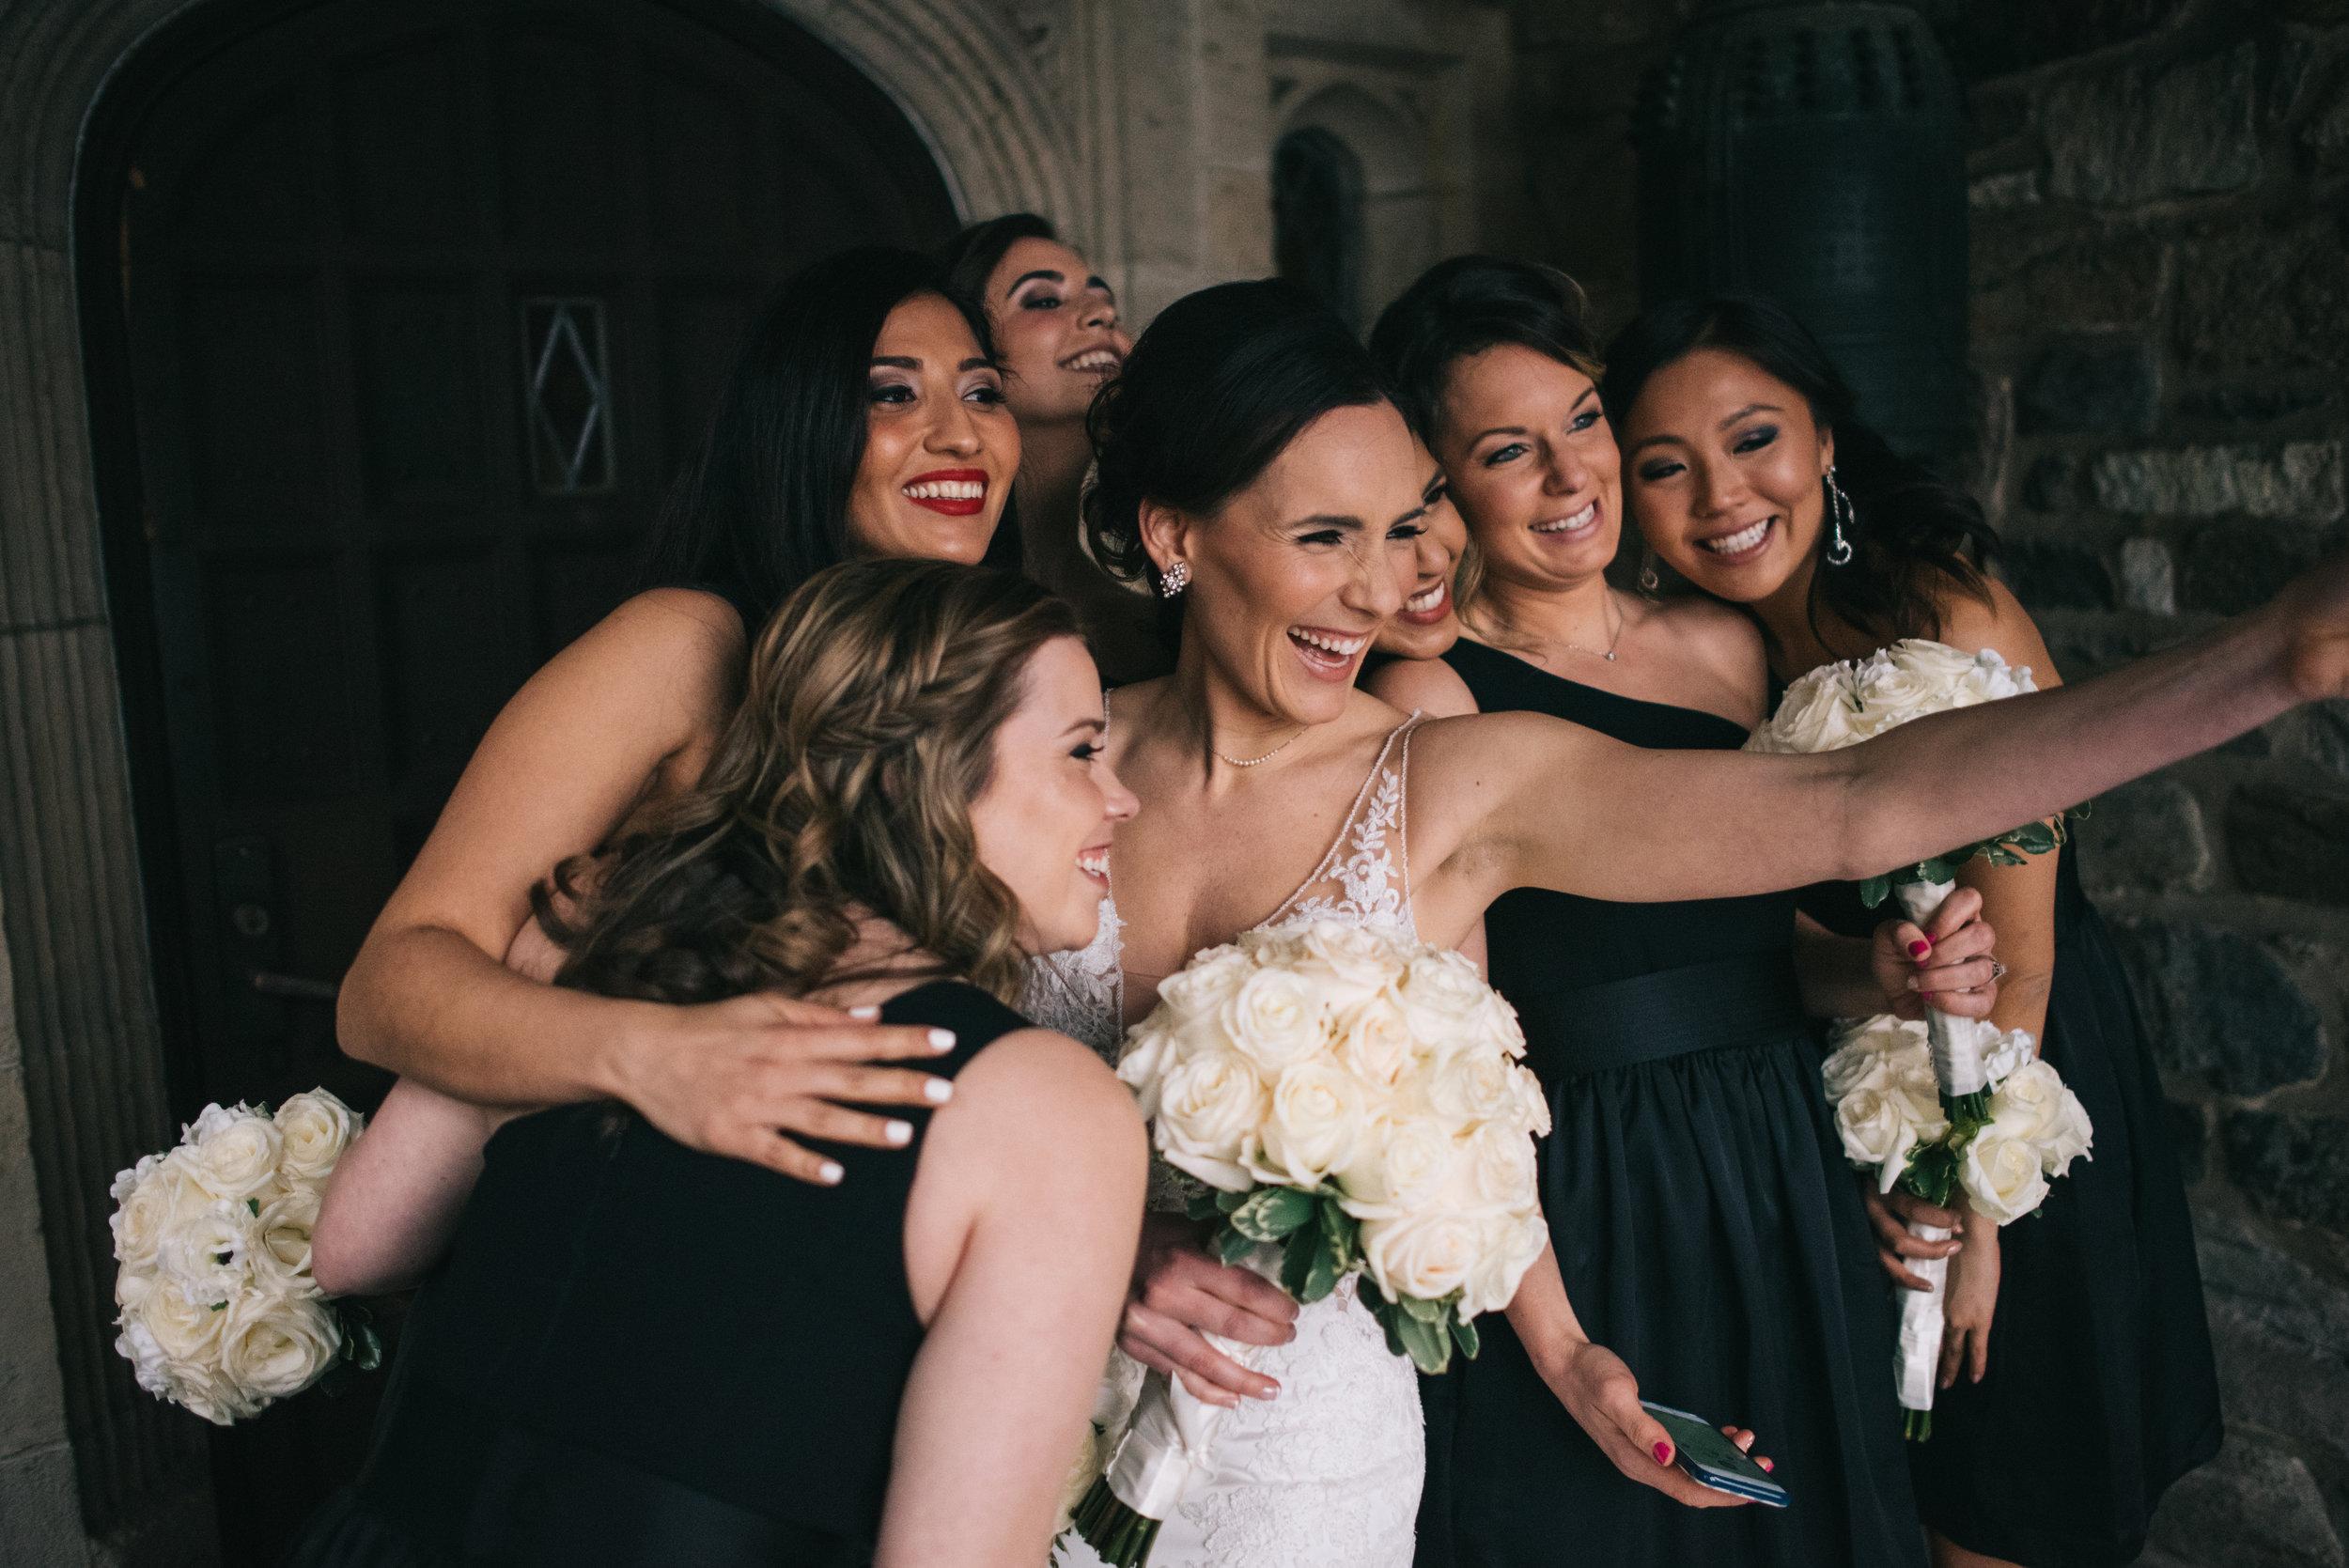 WeddingPhotos | NJPhotographer | Highlights-1-17.jpg